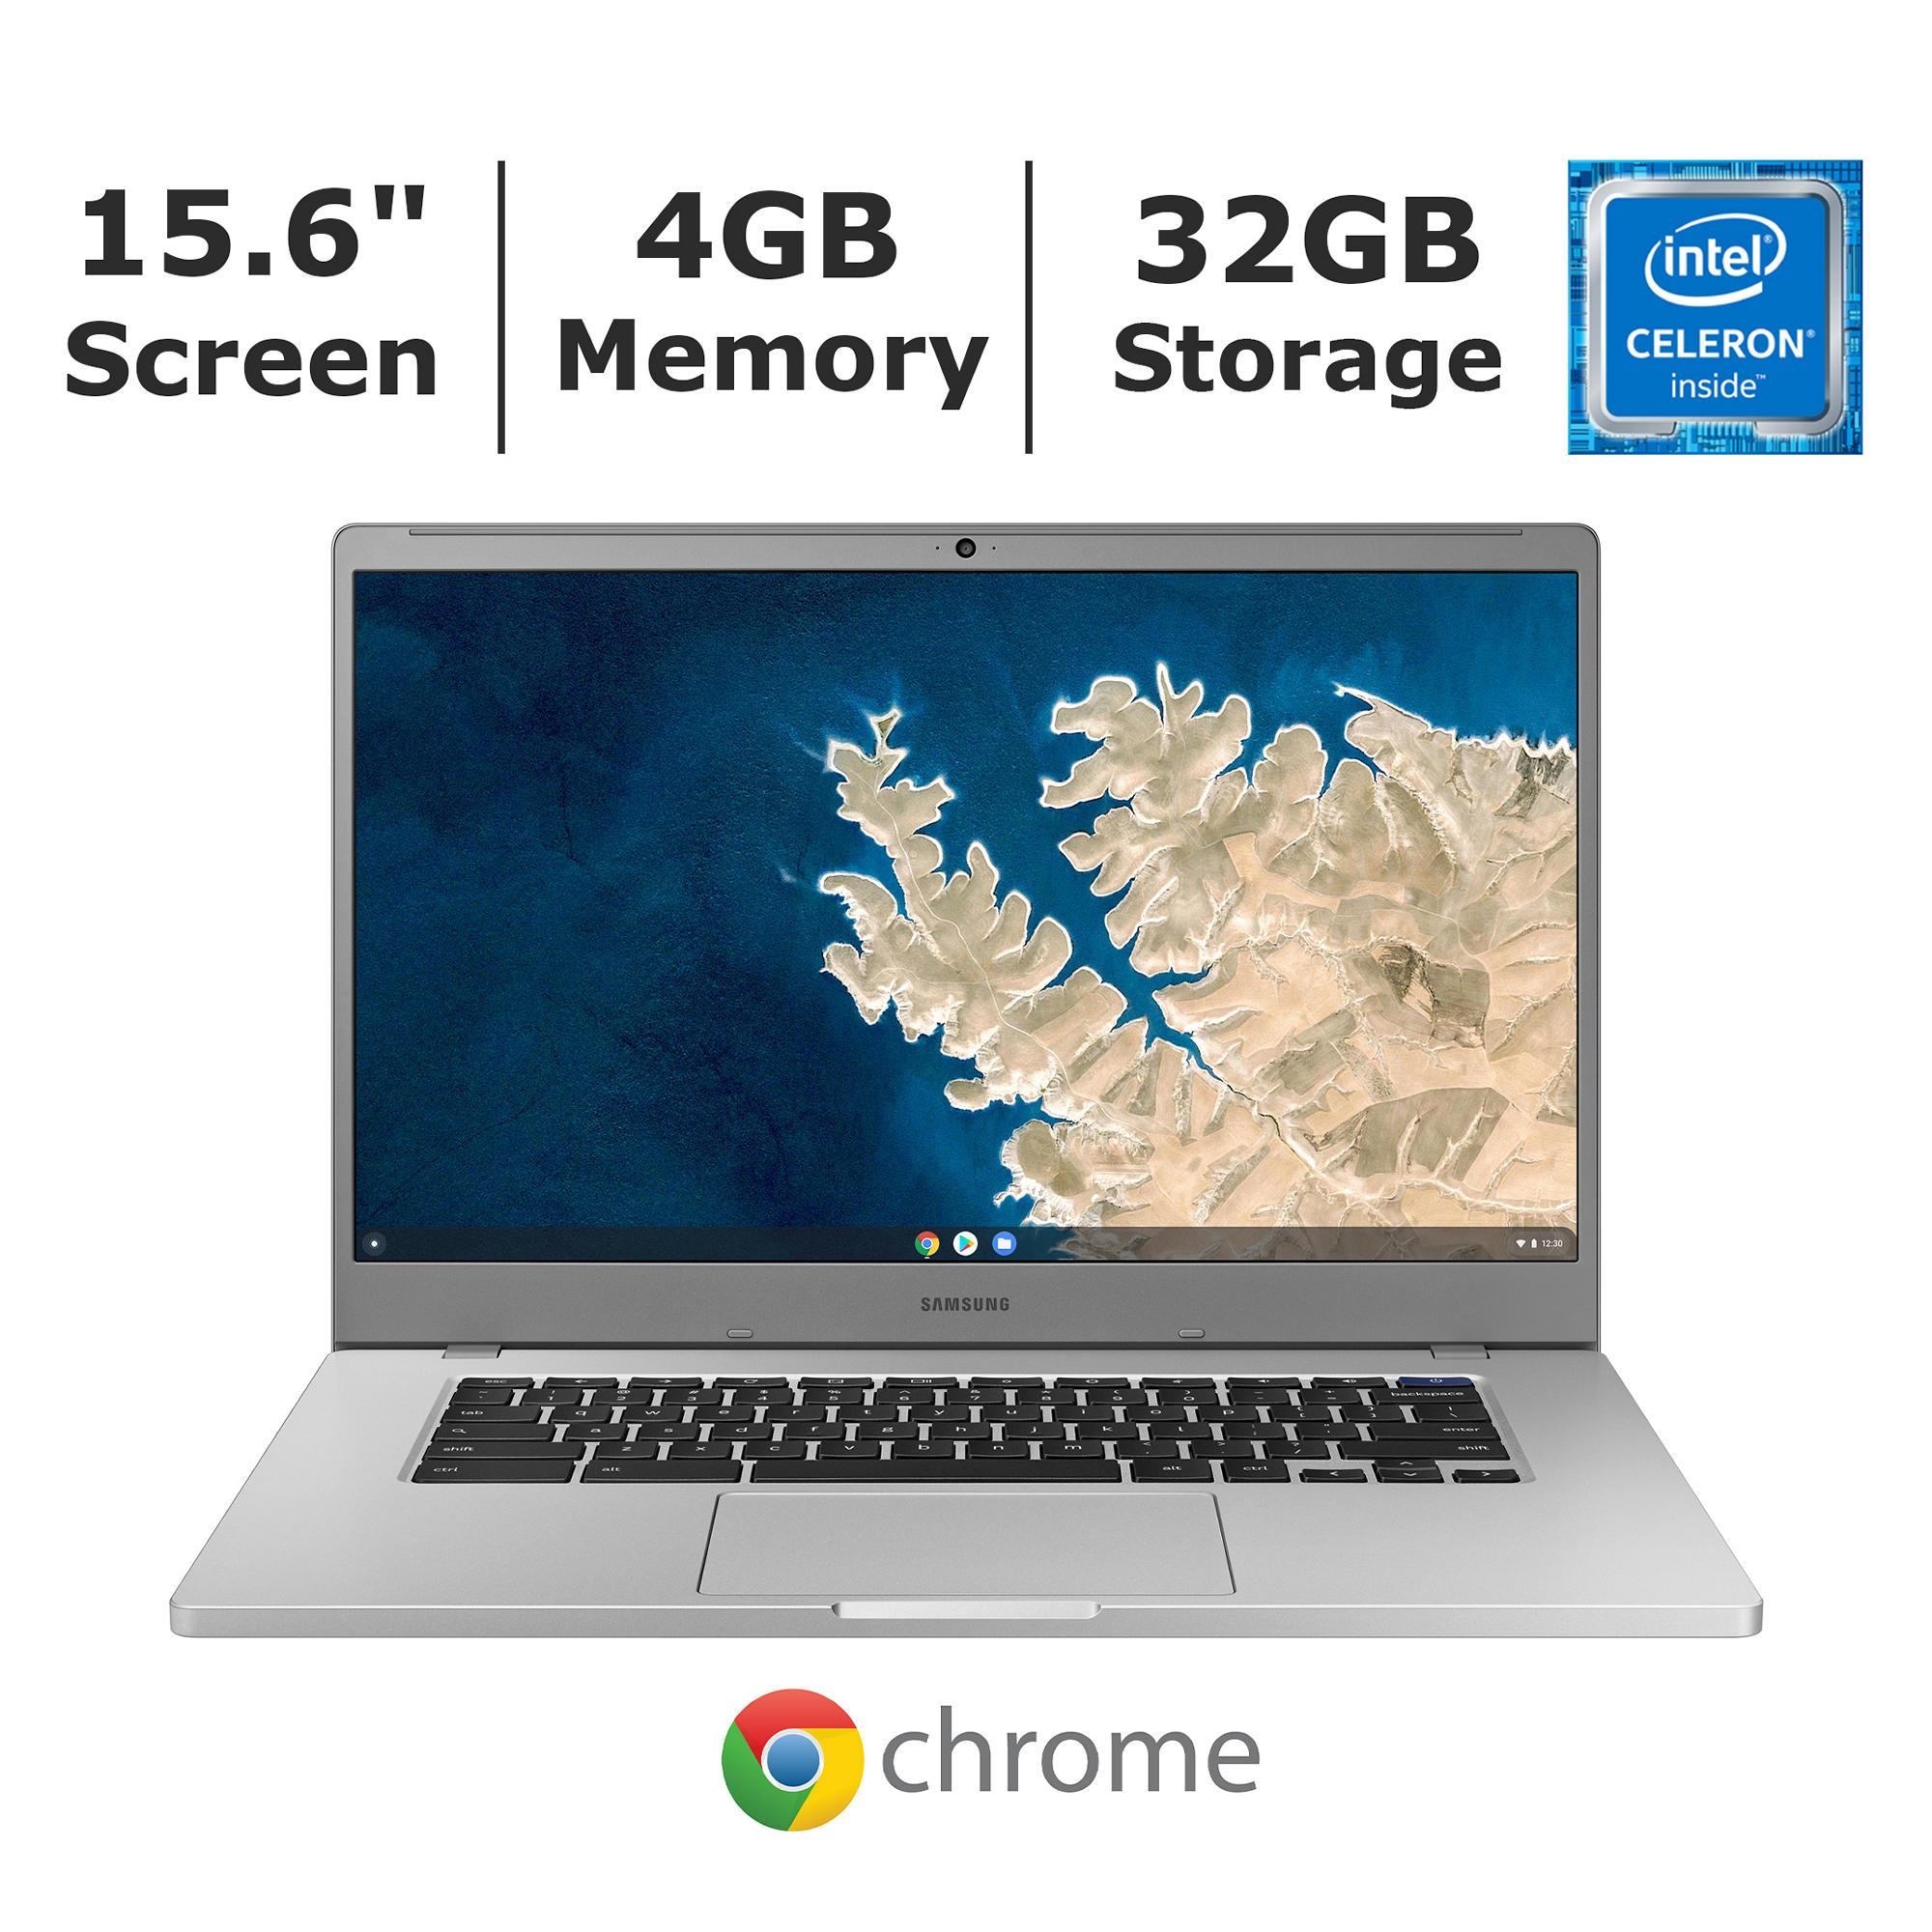 Samsung Chromebook 4+ Laptop, Intel Celeron N4000 Processor, 4GB Memory, 32GB SSD